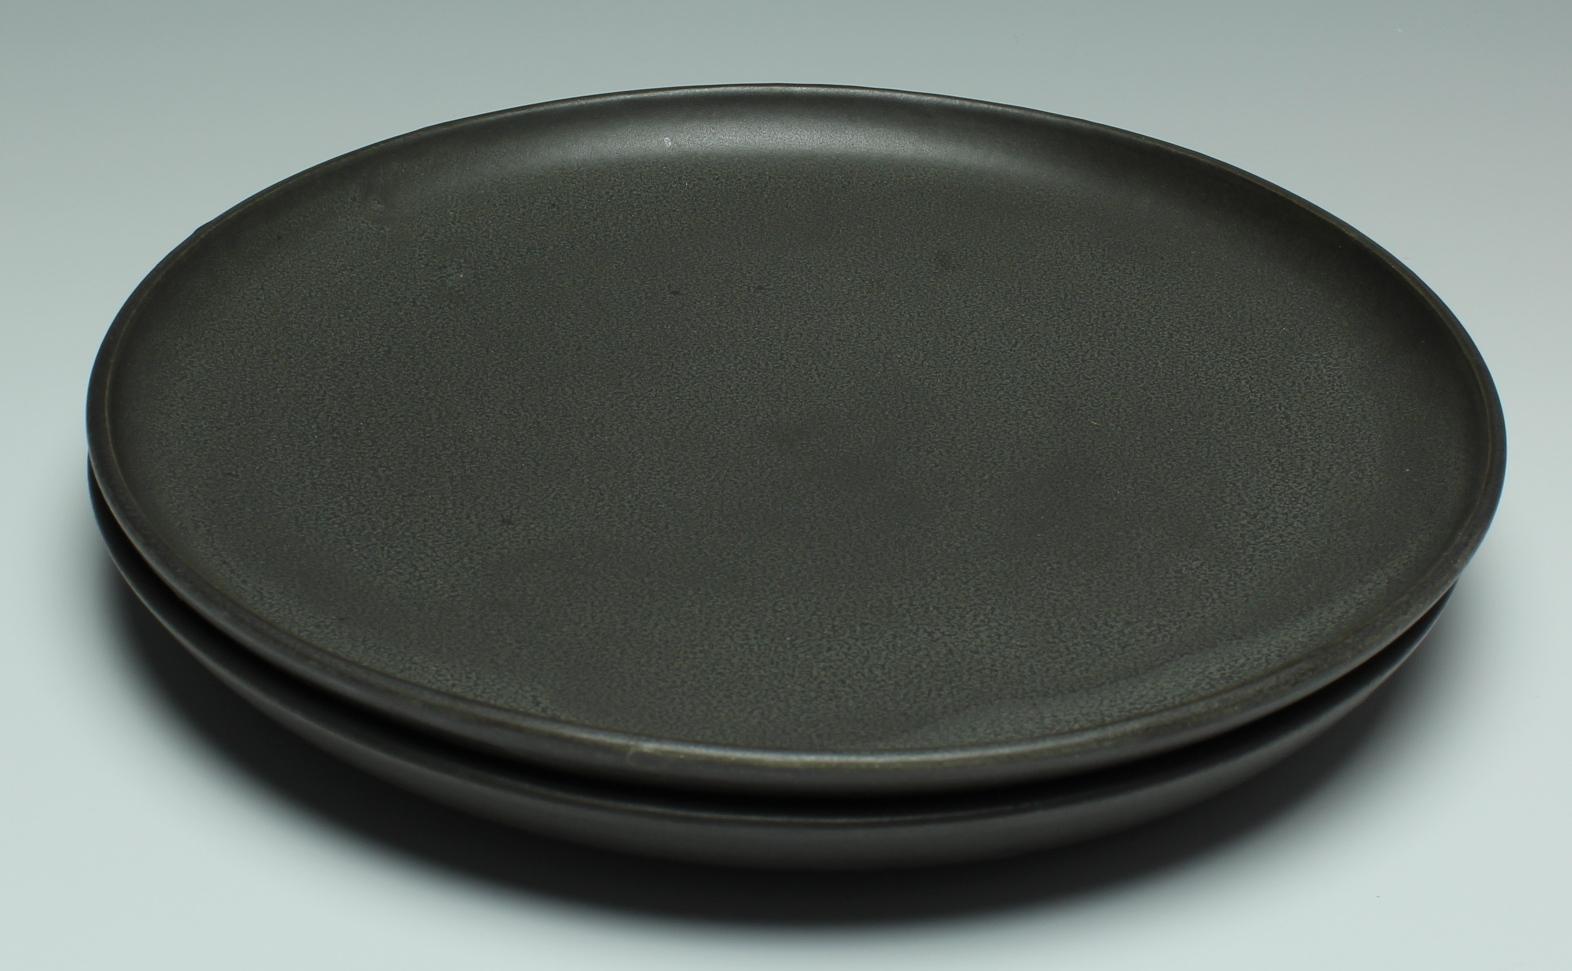 SaladPlates_Charcoal.JPG